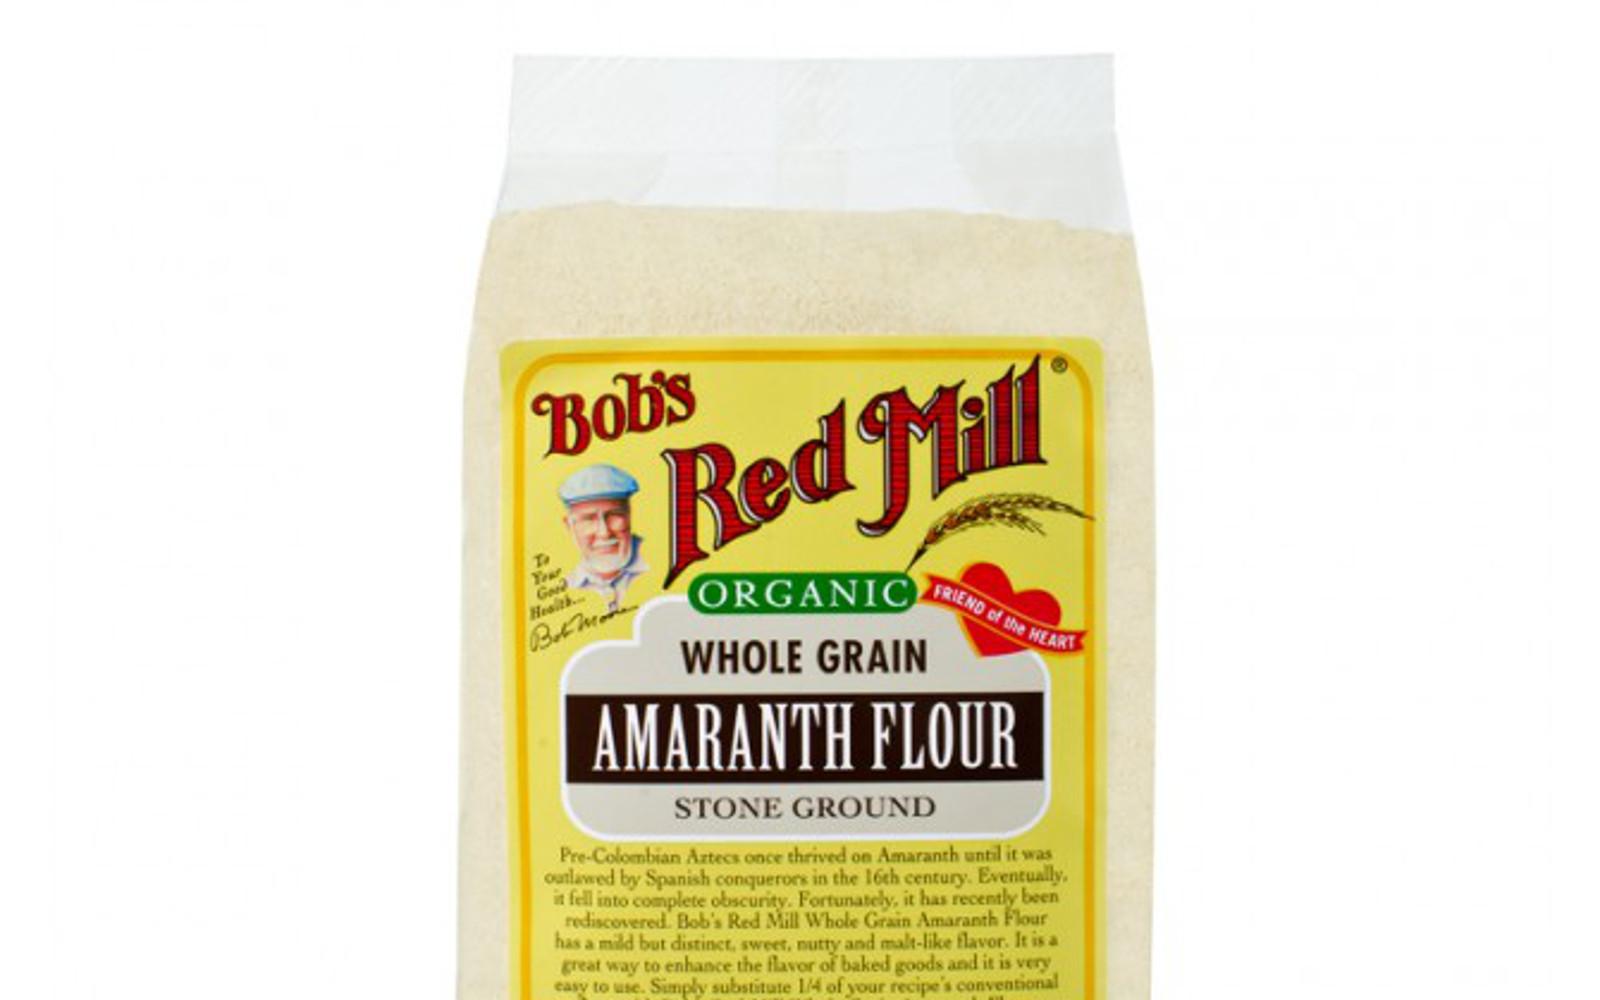 Bob's Red Mill Amaranth Flour